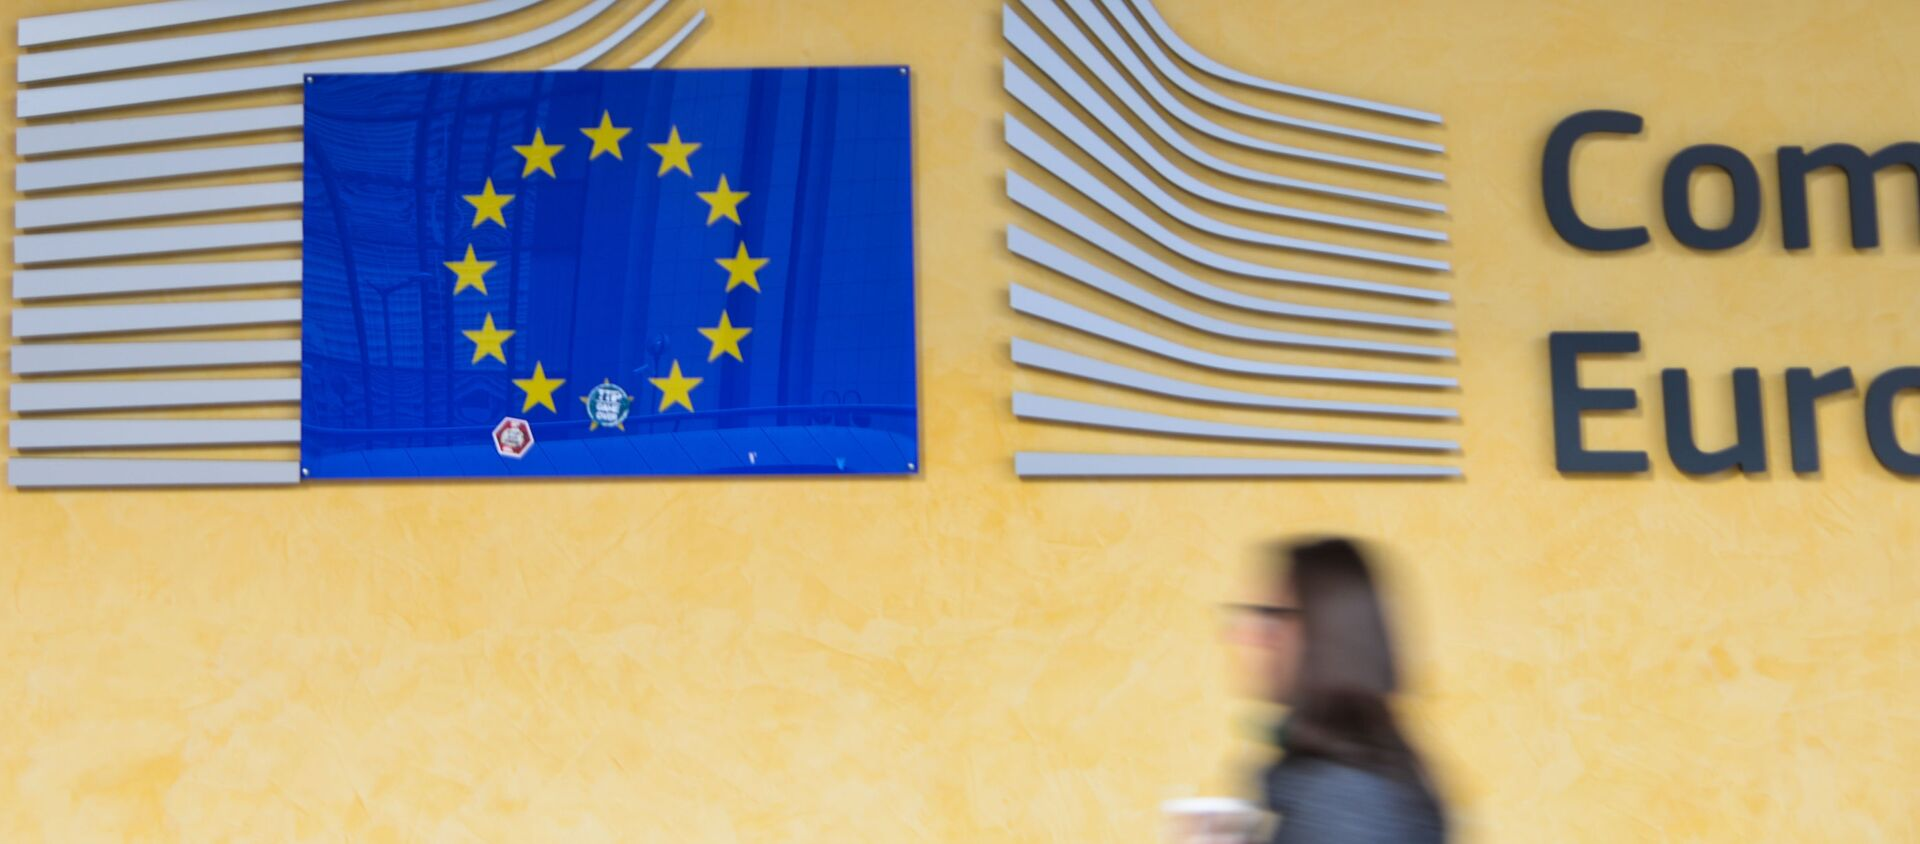 Komisja Europejska - Sputnik Polska, 1920, 02.07.2020